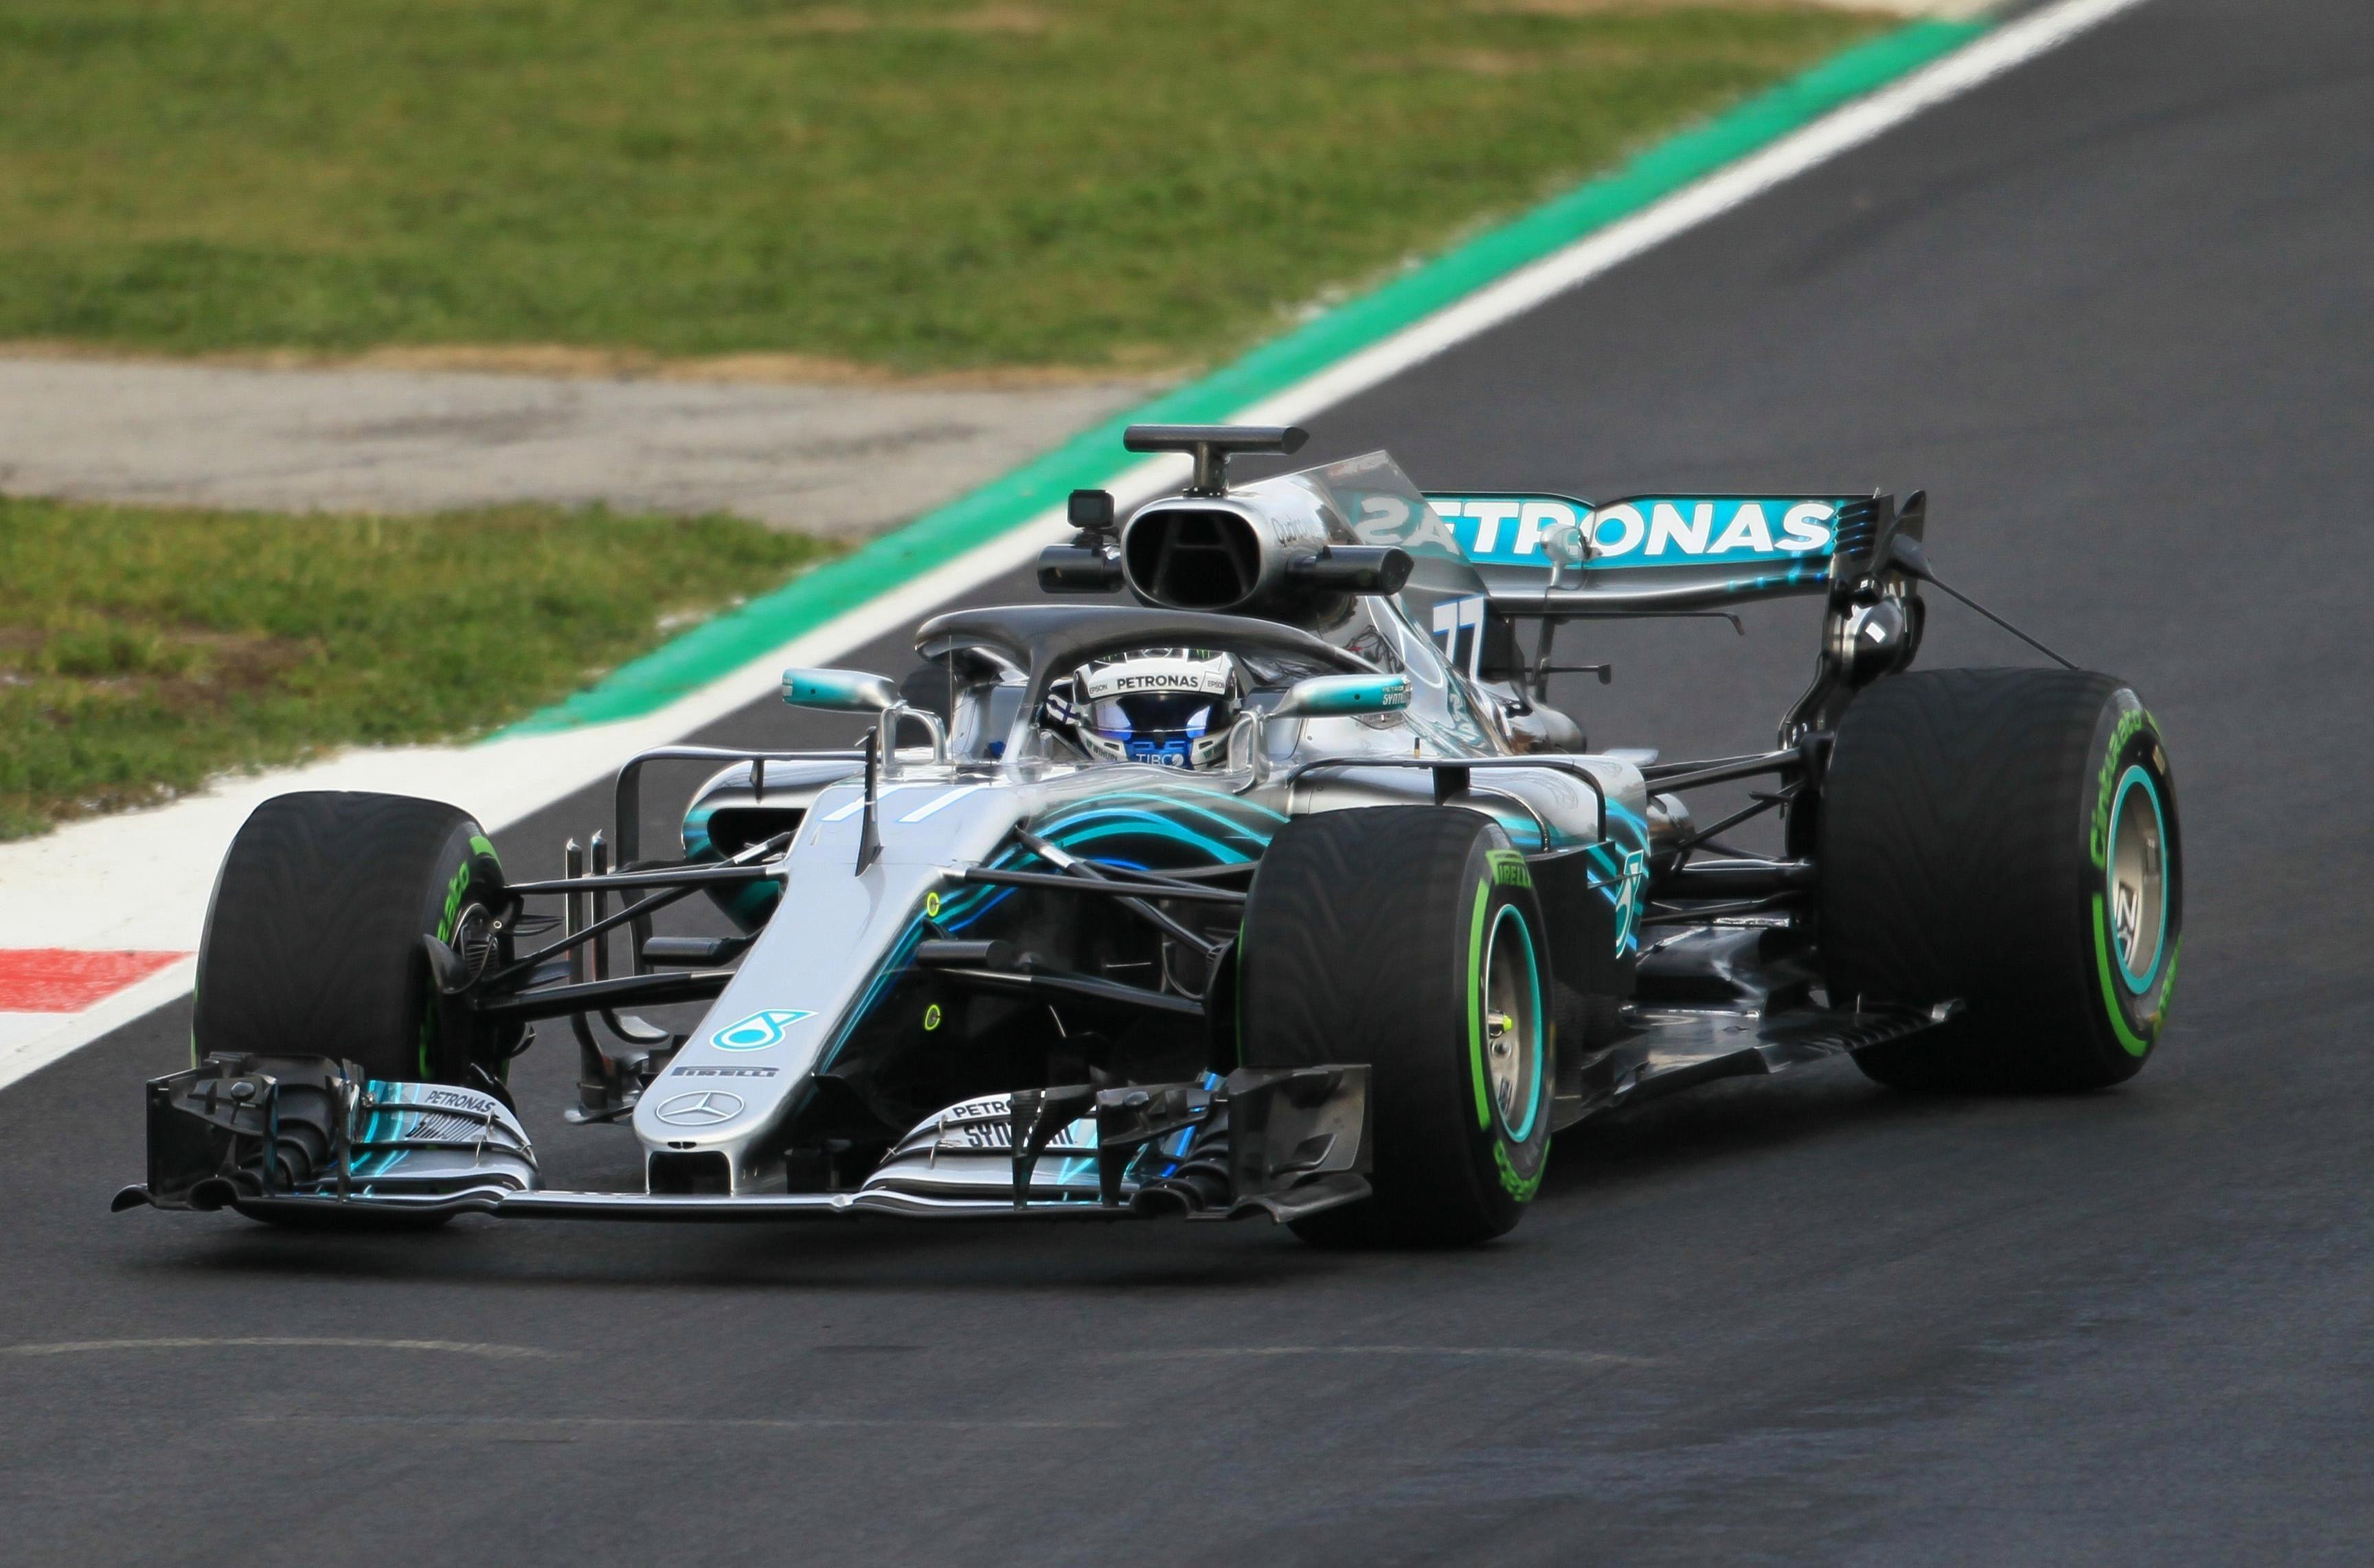 Hamilton's Mercedes partner Valtteri Bottas as racked up 152 laps in the car